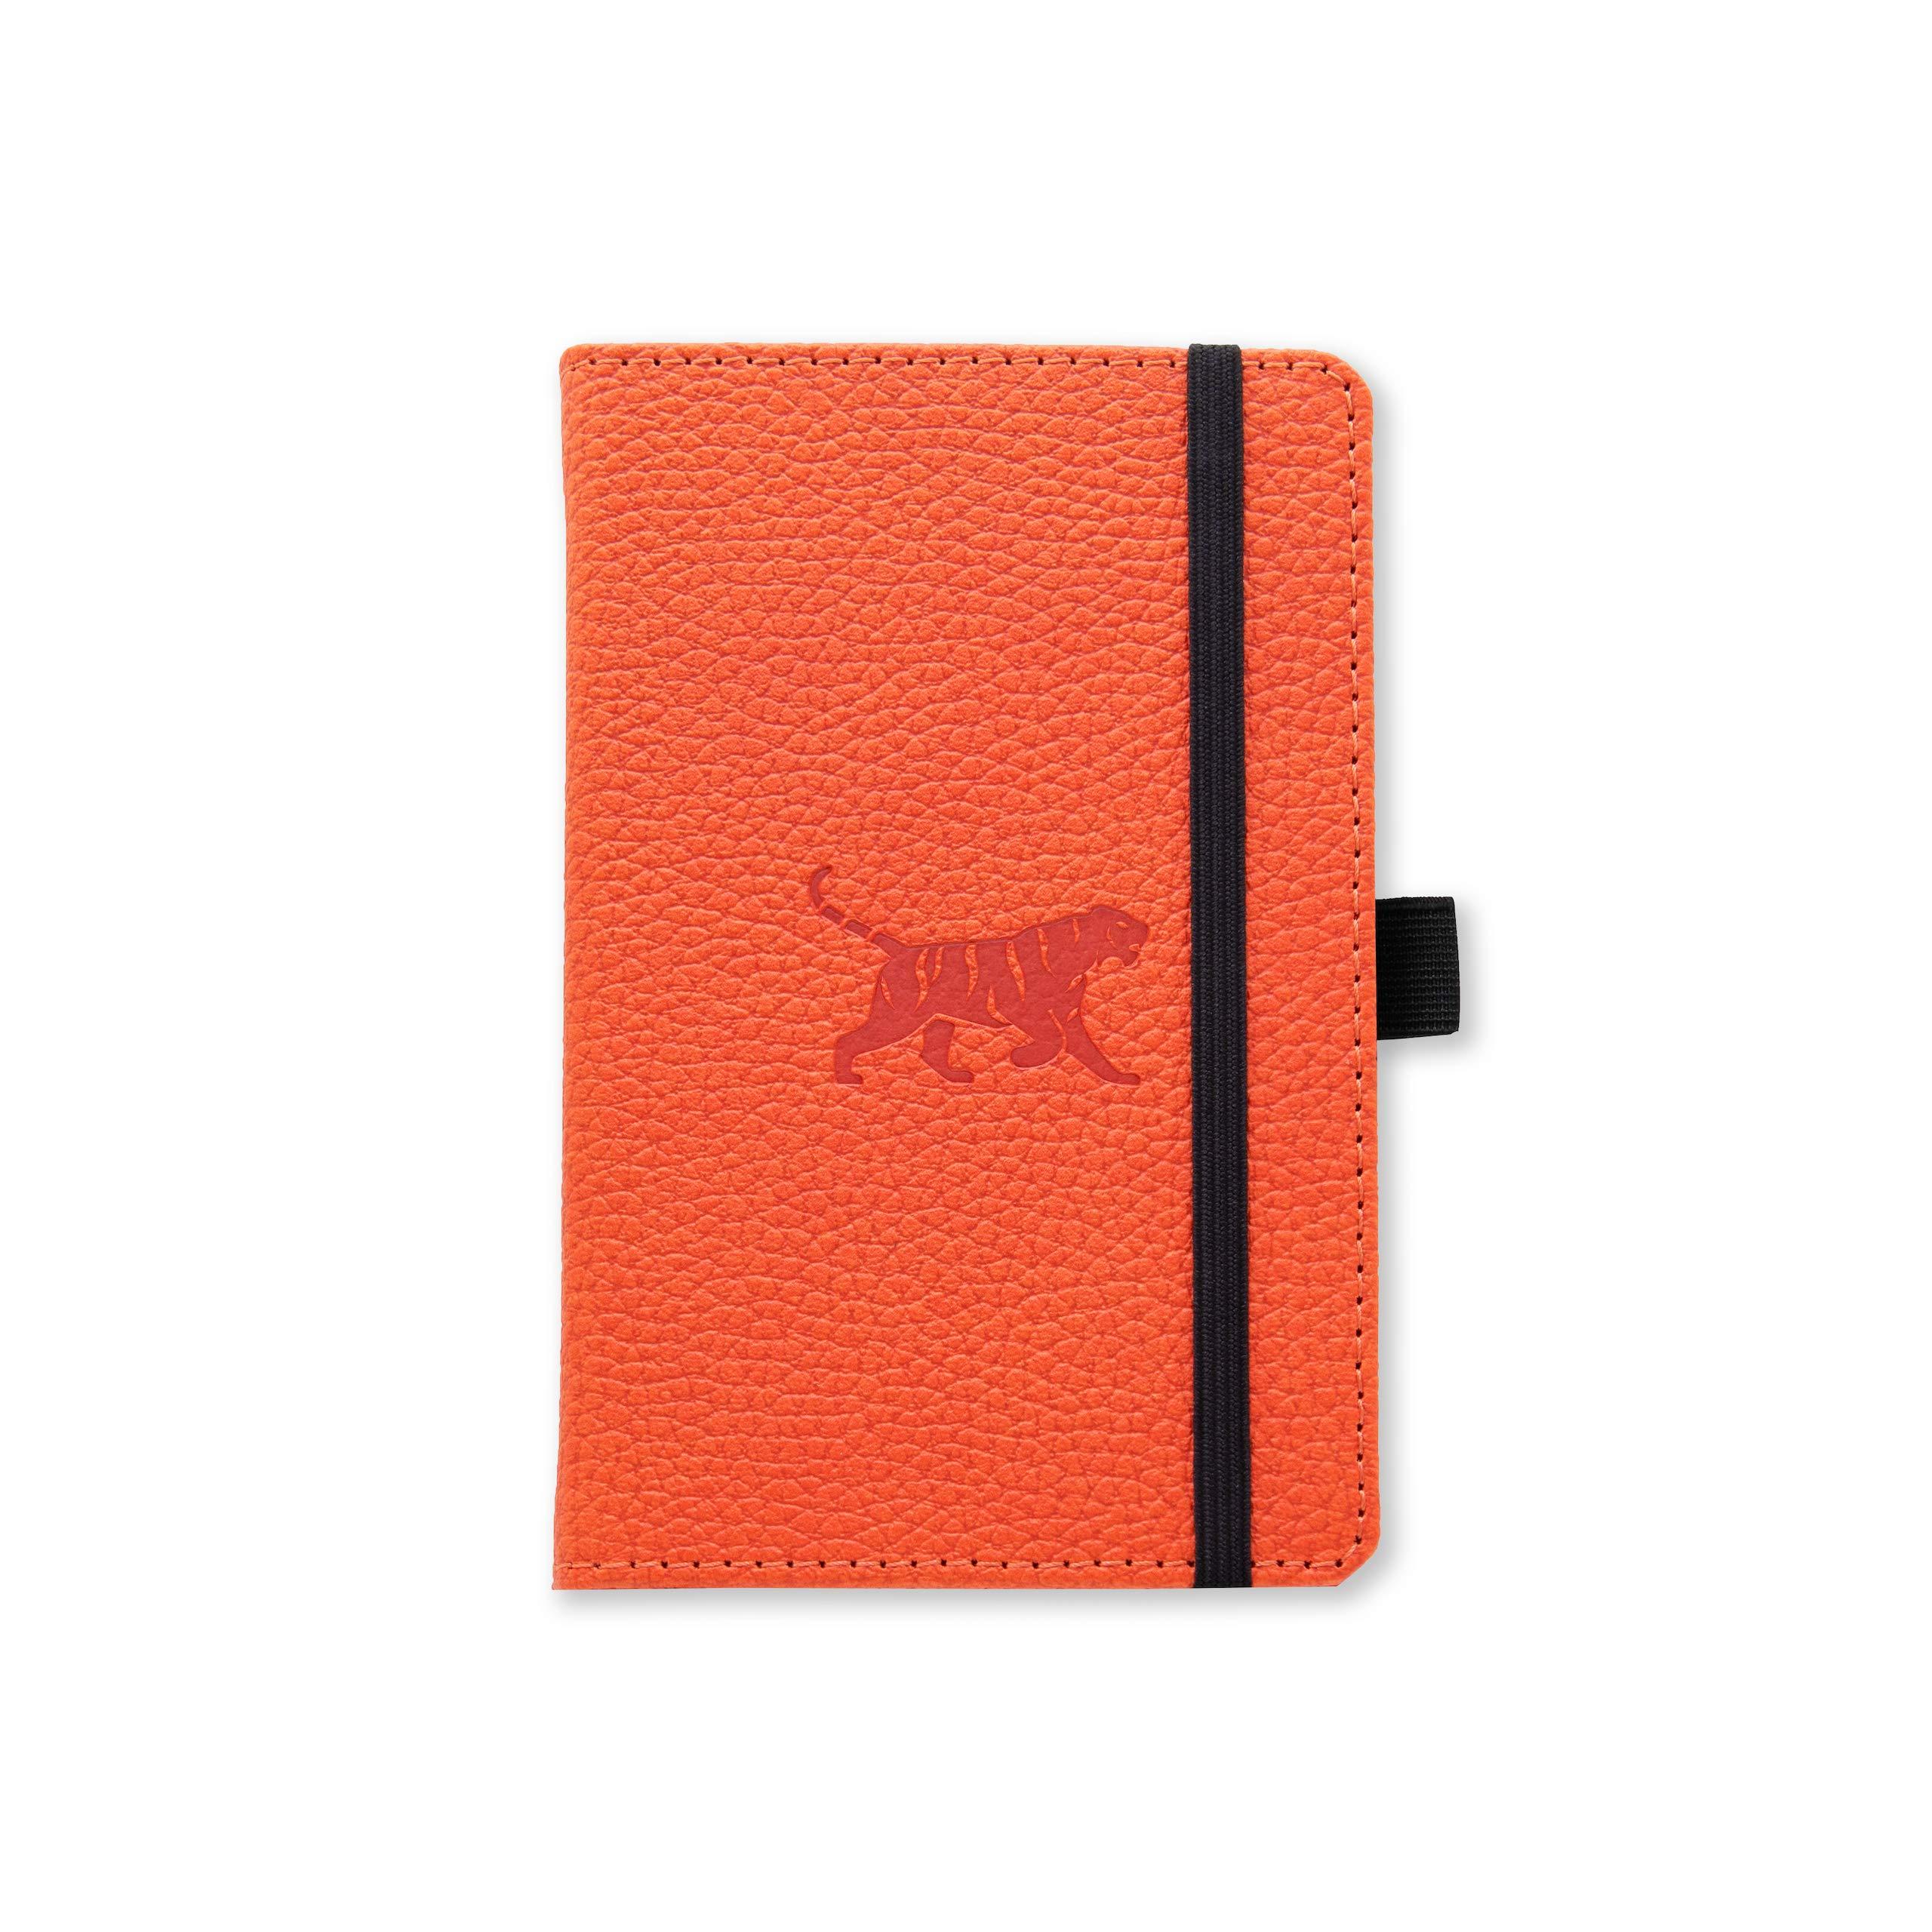 Dingbats Wildlife Dotted Pocket A6 Hardcover Notebook - PU Leather, Perforated 100gsm Ink-Proof Paper, Pocket, Elastic Closure, Pen Holder, Bookmark (Orange Tiger)